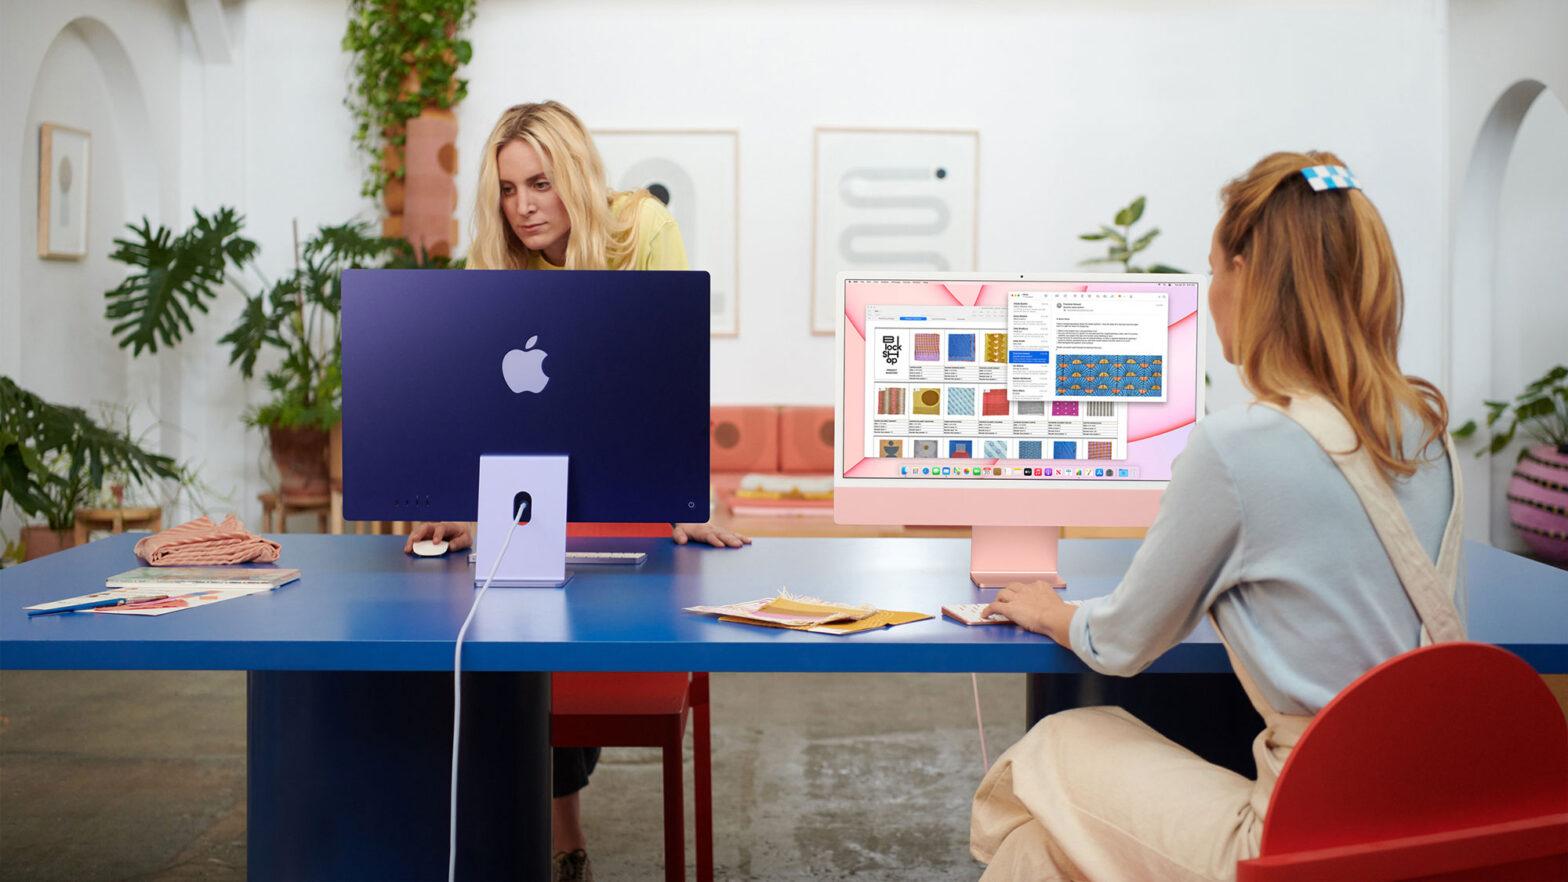 2021 24-inch Apple iMac Computer